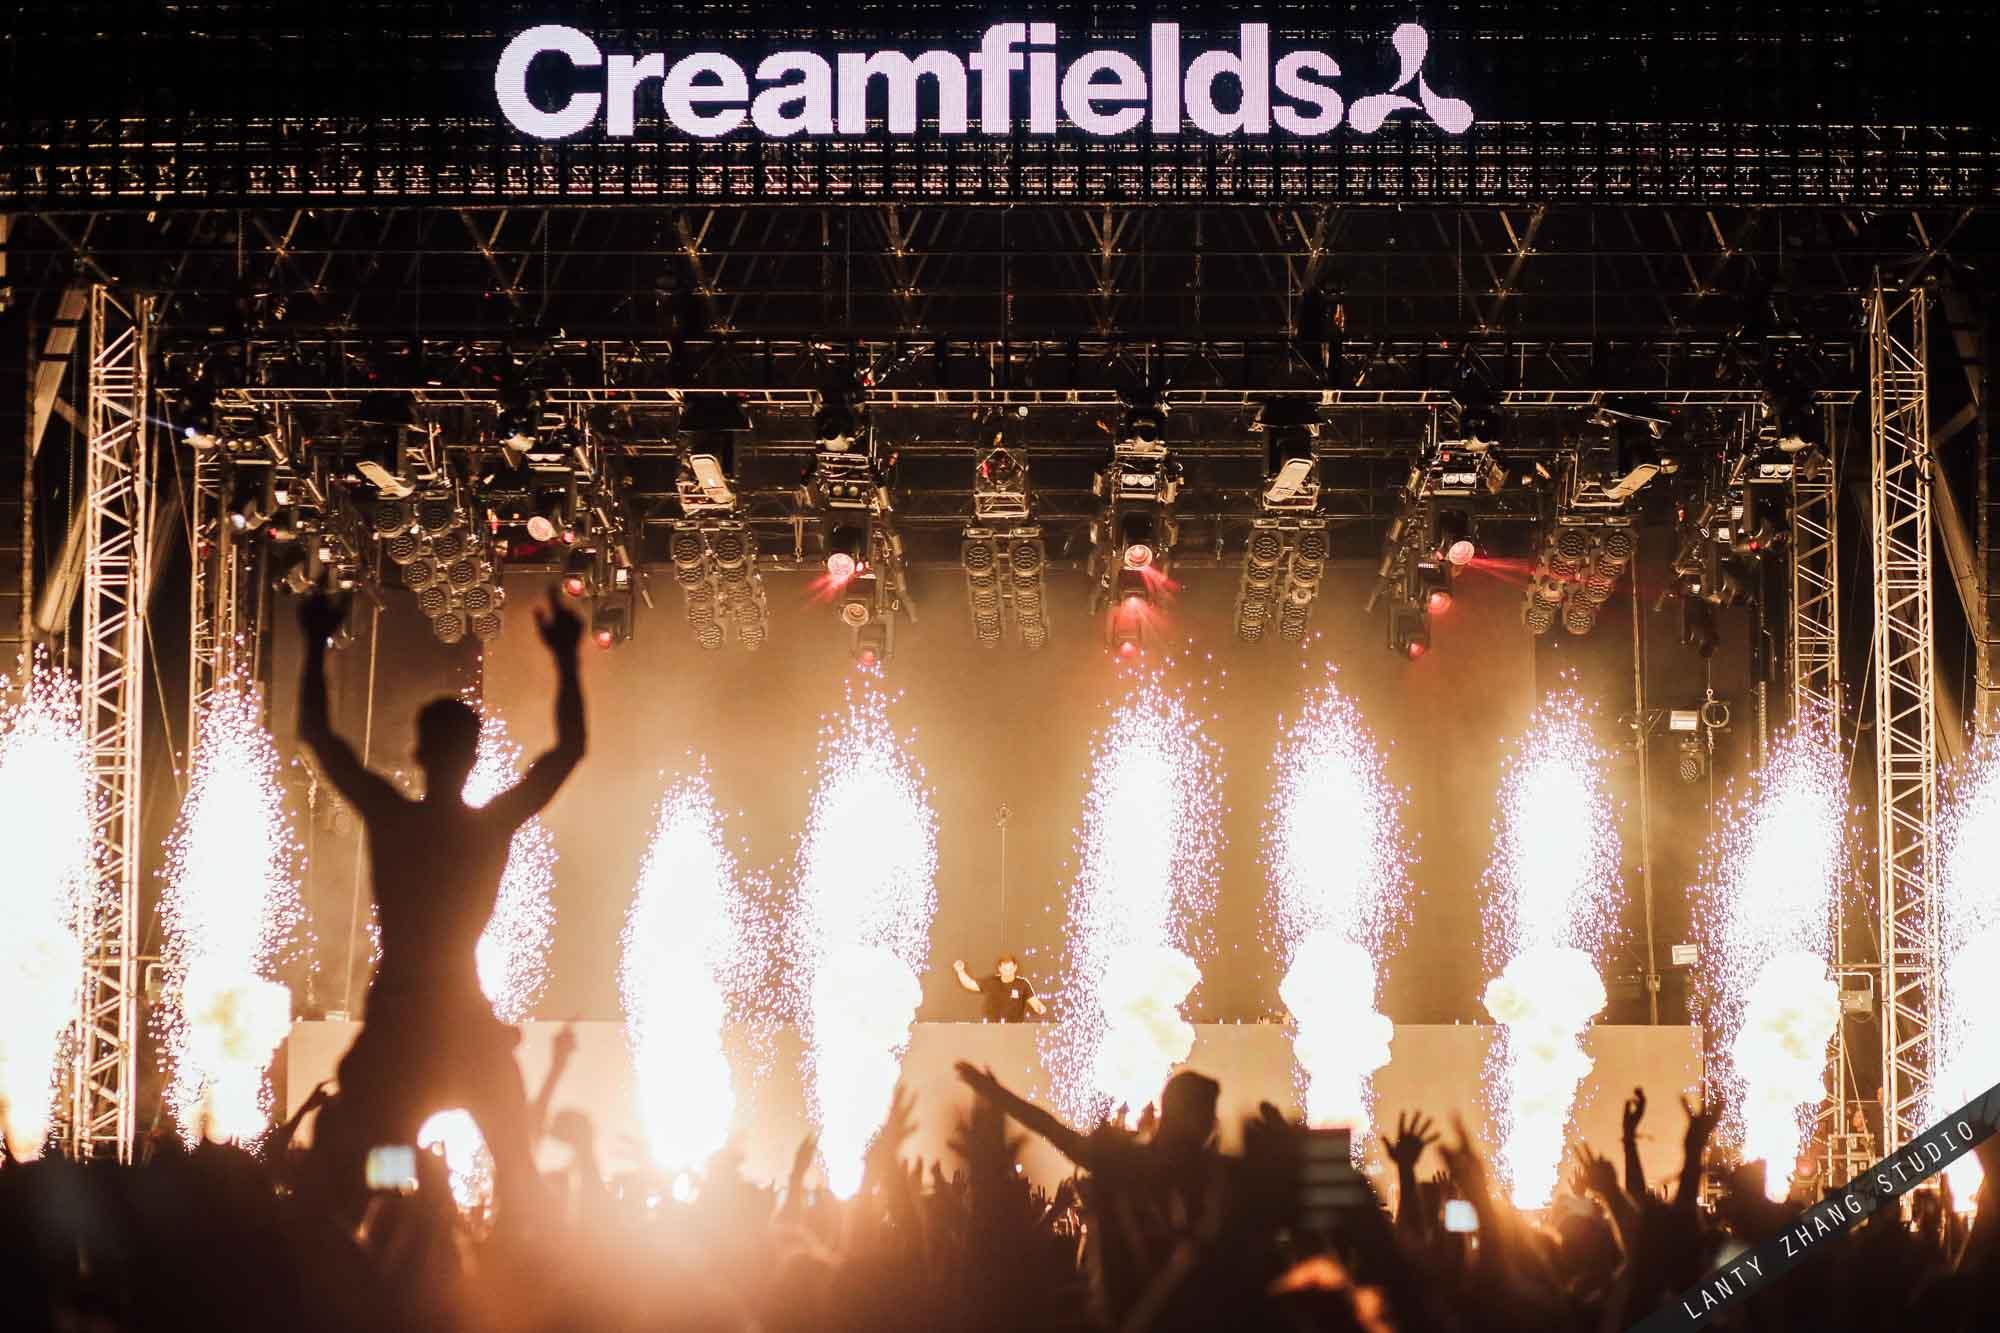 Creamfields-lanty-hardwell-small-22